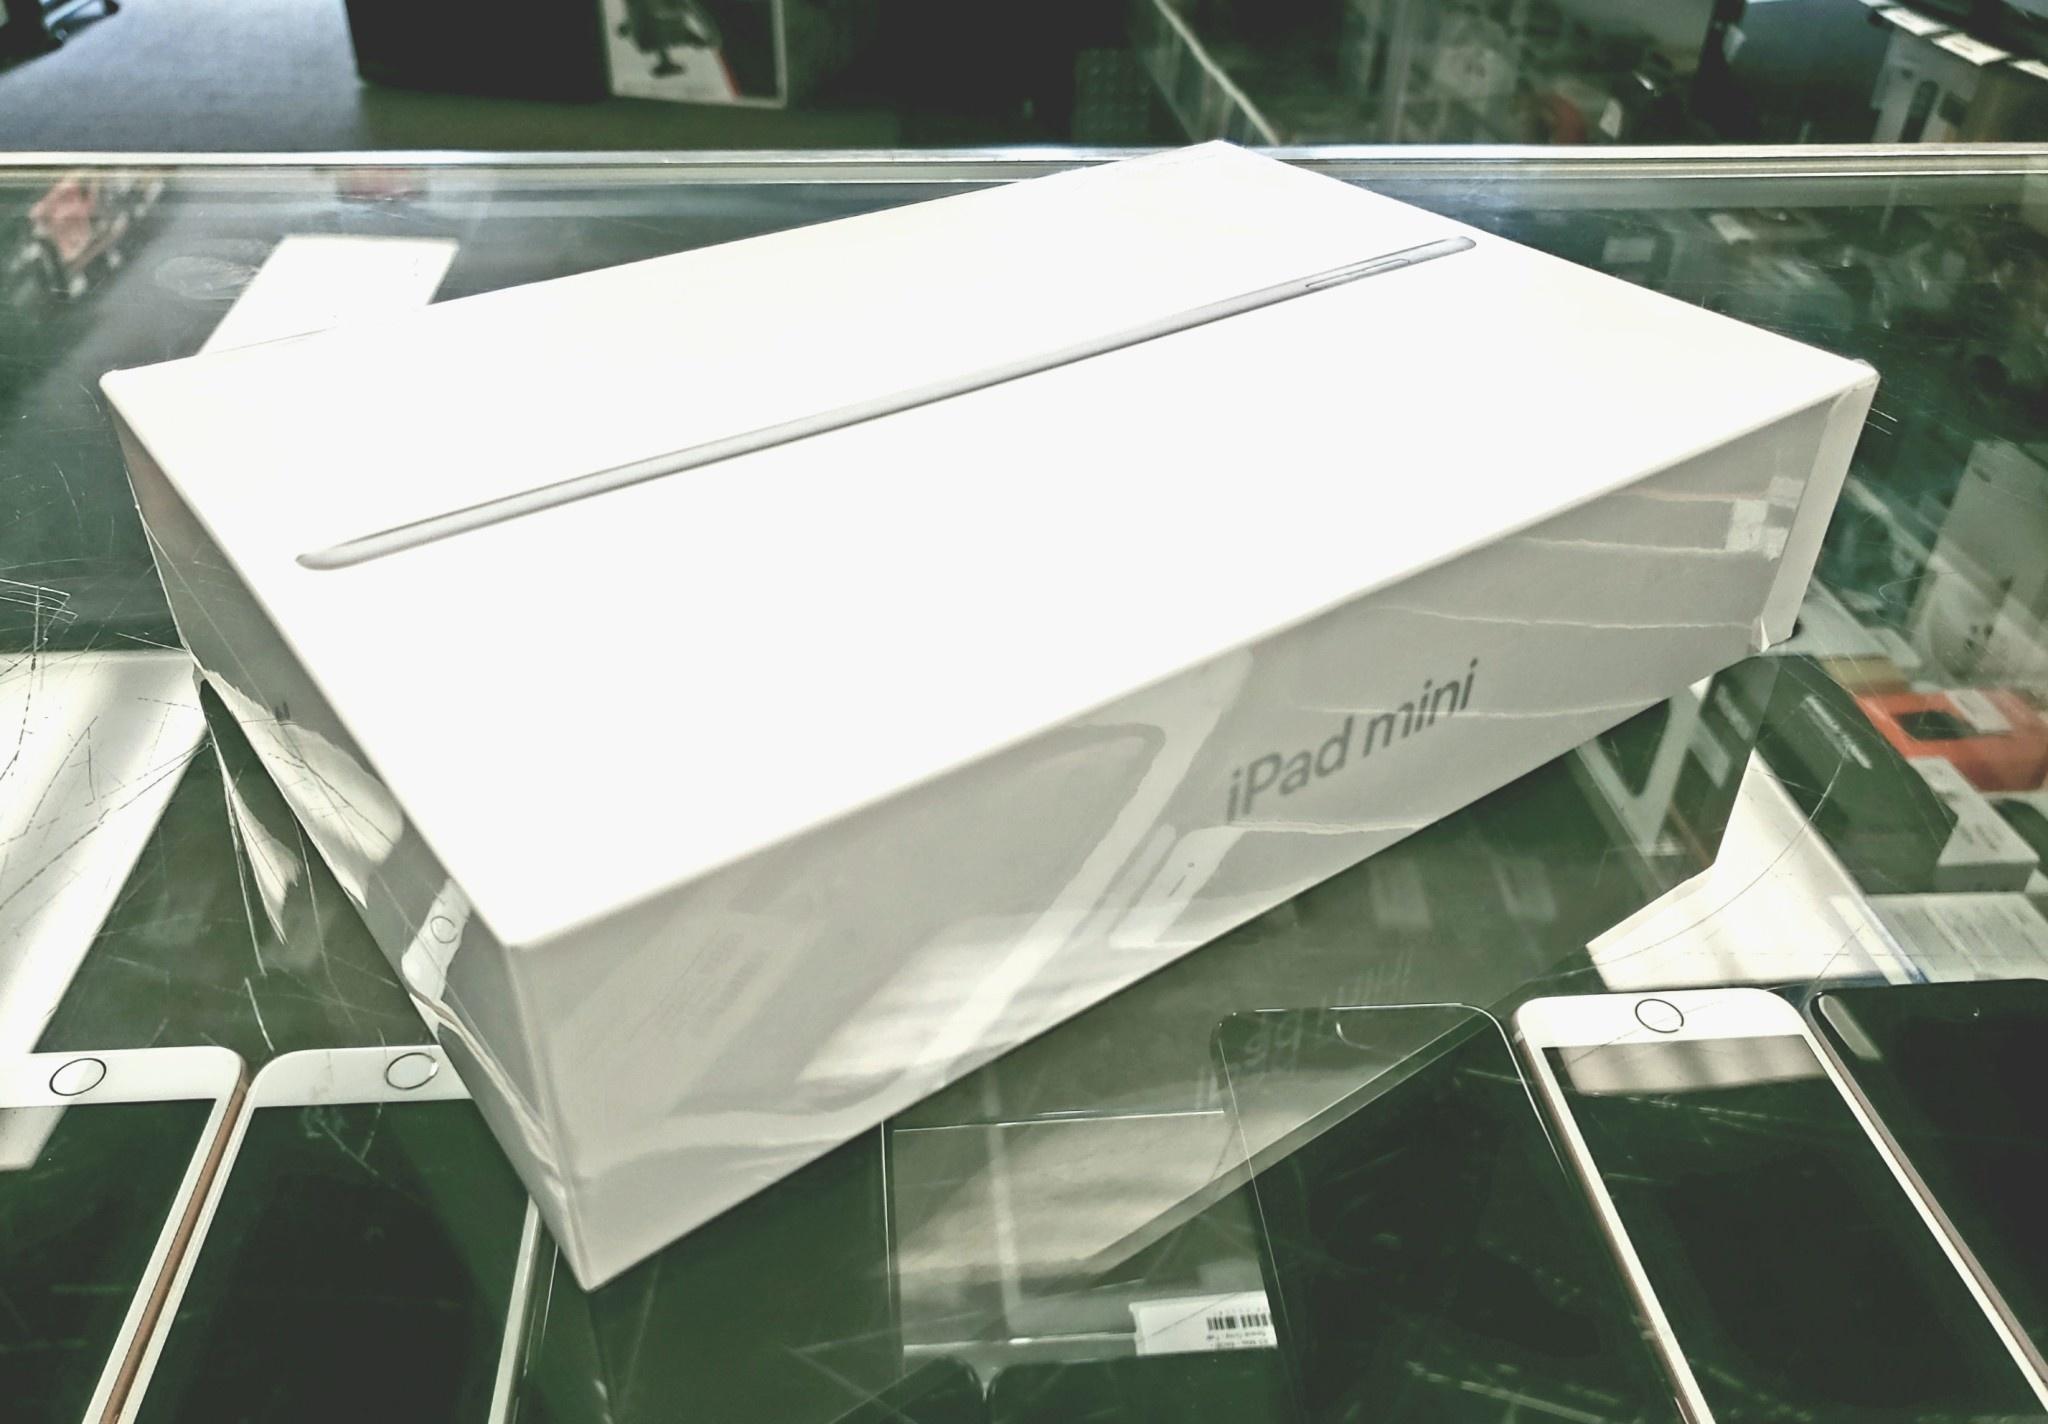 Factory Sealed - Apple iPad Mini 5 - 256GB - White/Silver